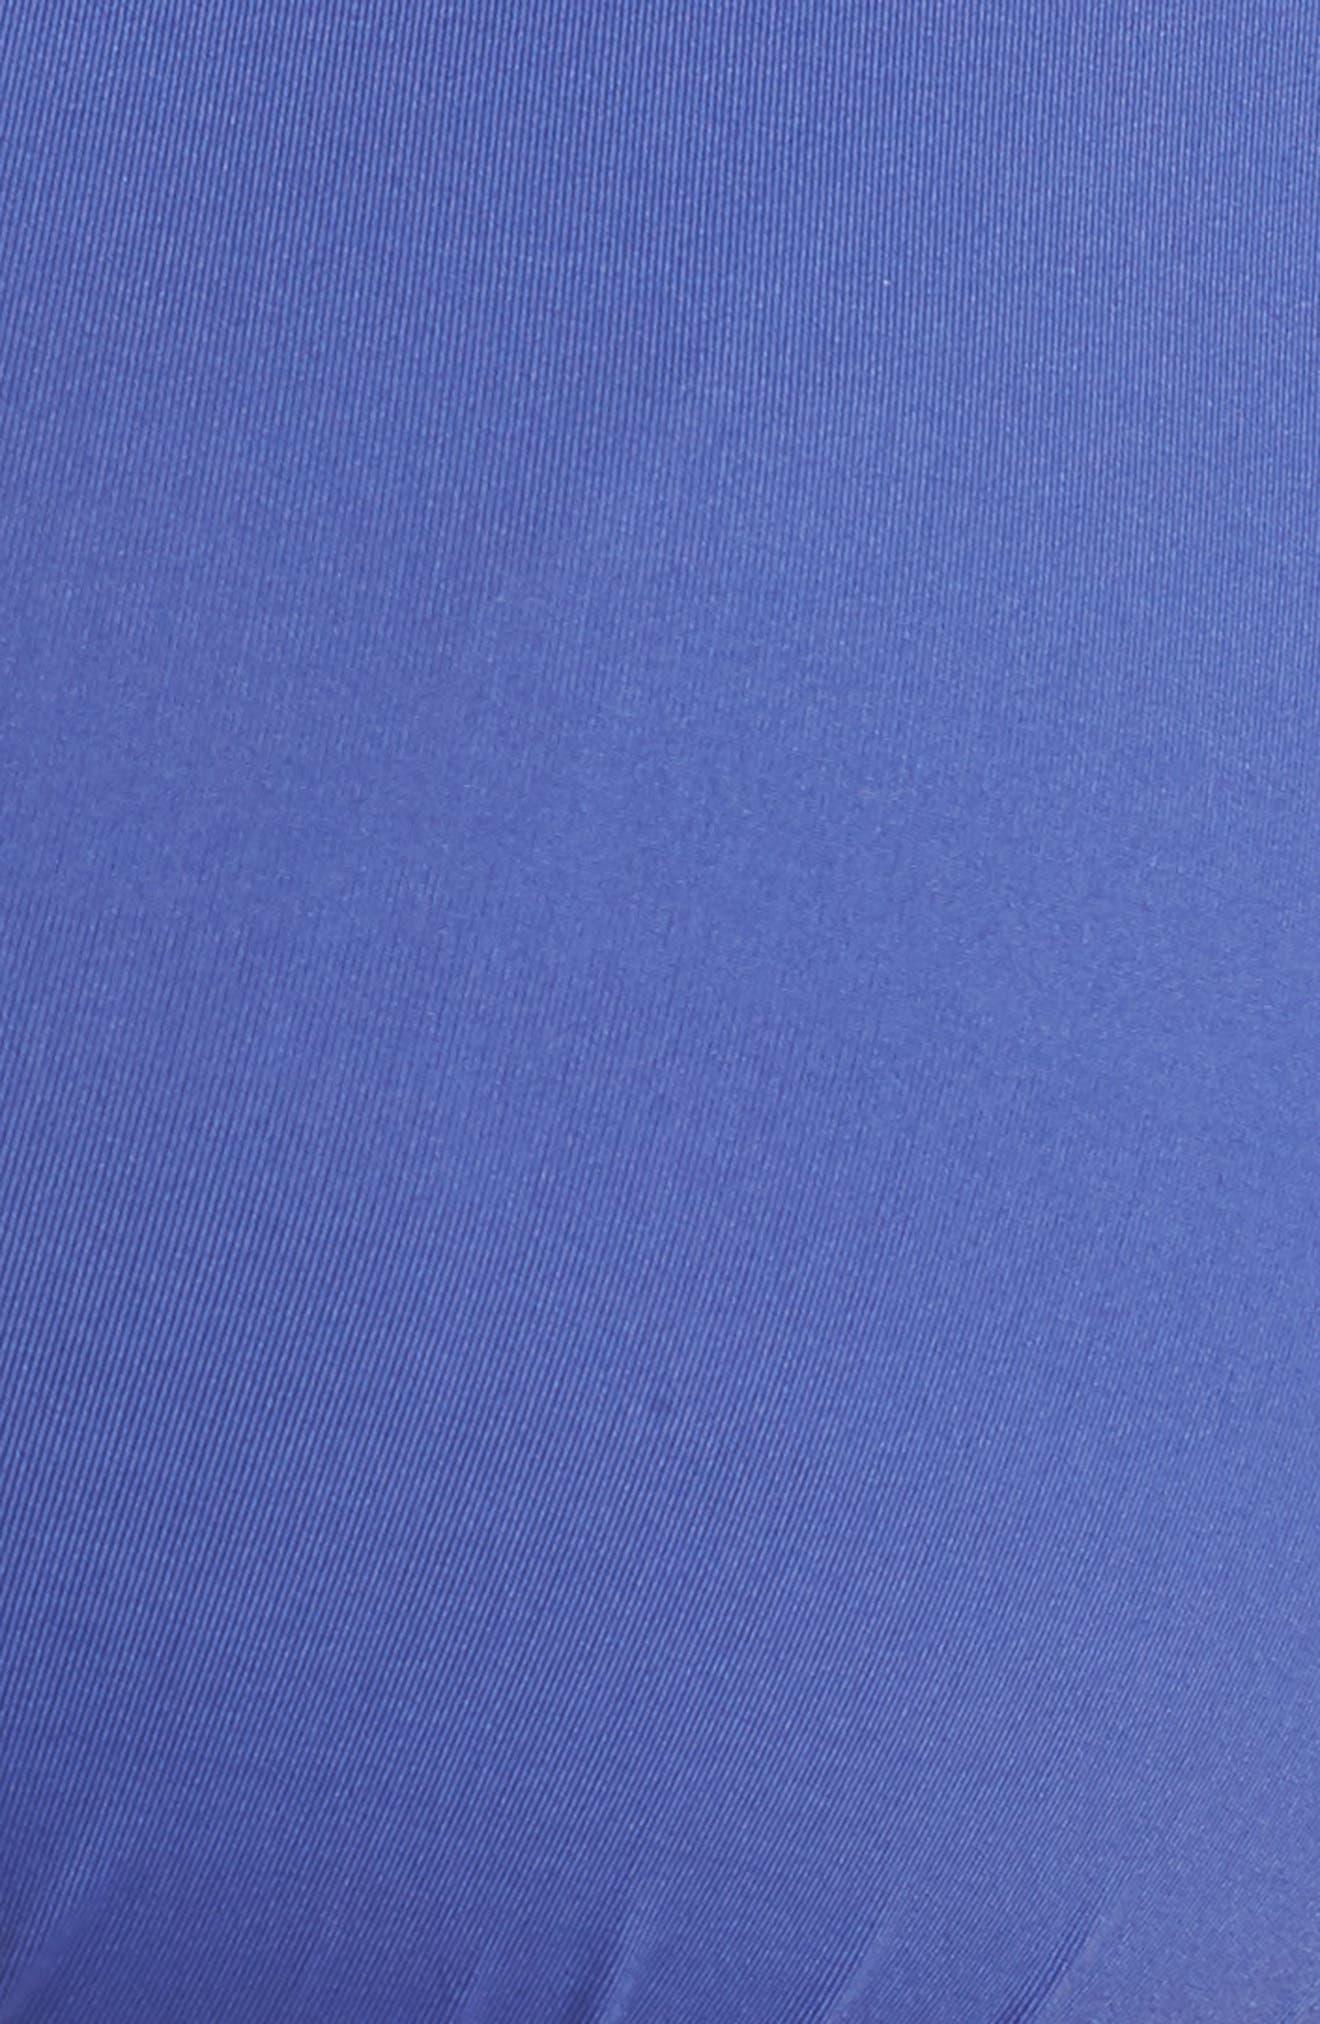 BECCA ETC., Becca Etc Color Code Bikini Top, Alternate thumbnail 6, color, BLUE TOPAZ